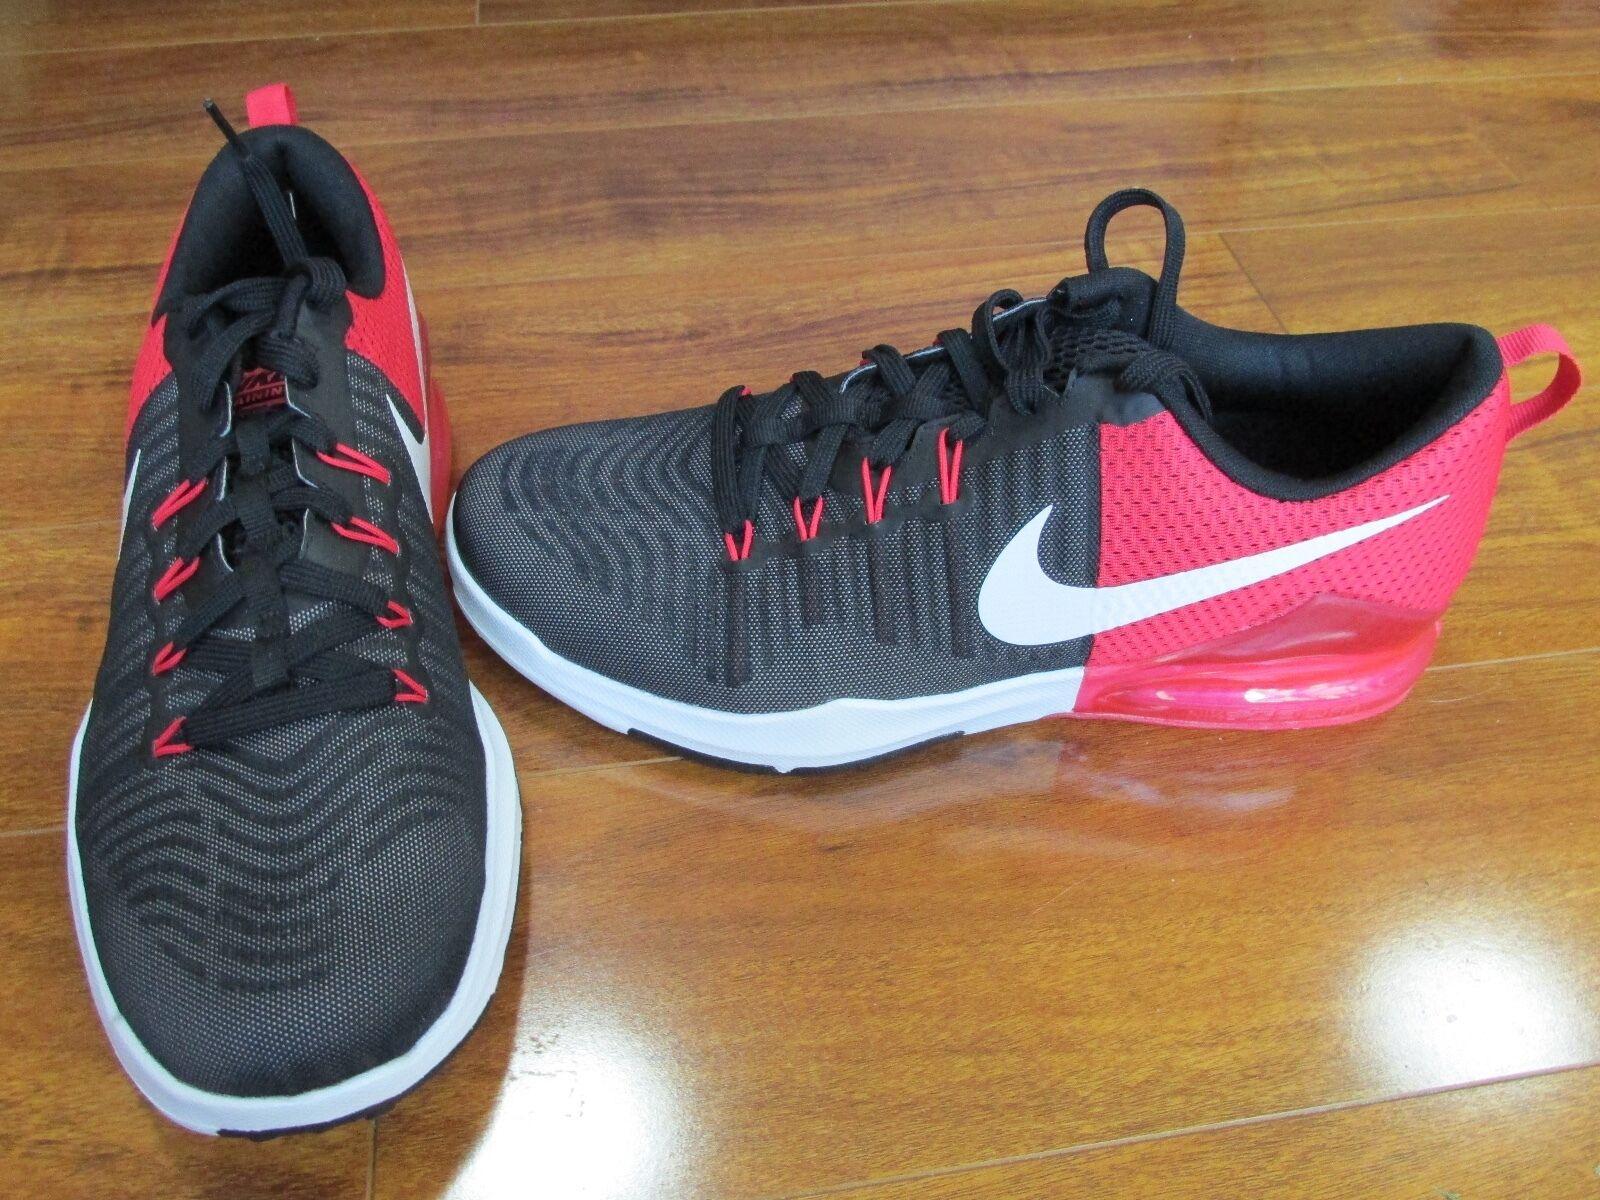 Nike lunarepic basso flyknit 2 explorer 8 bronzo bronzo 8 bianco nero 904742-100  140 970a6d